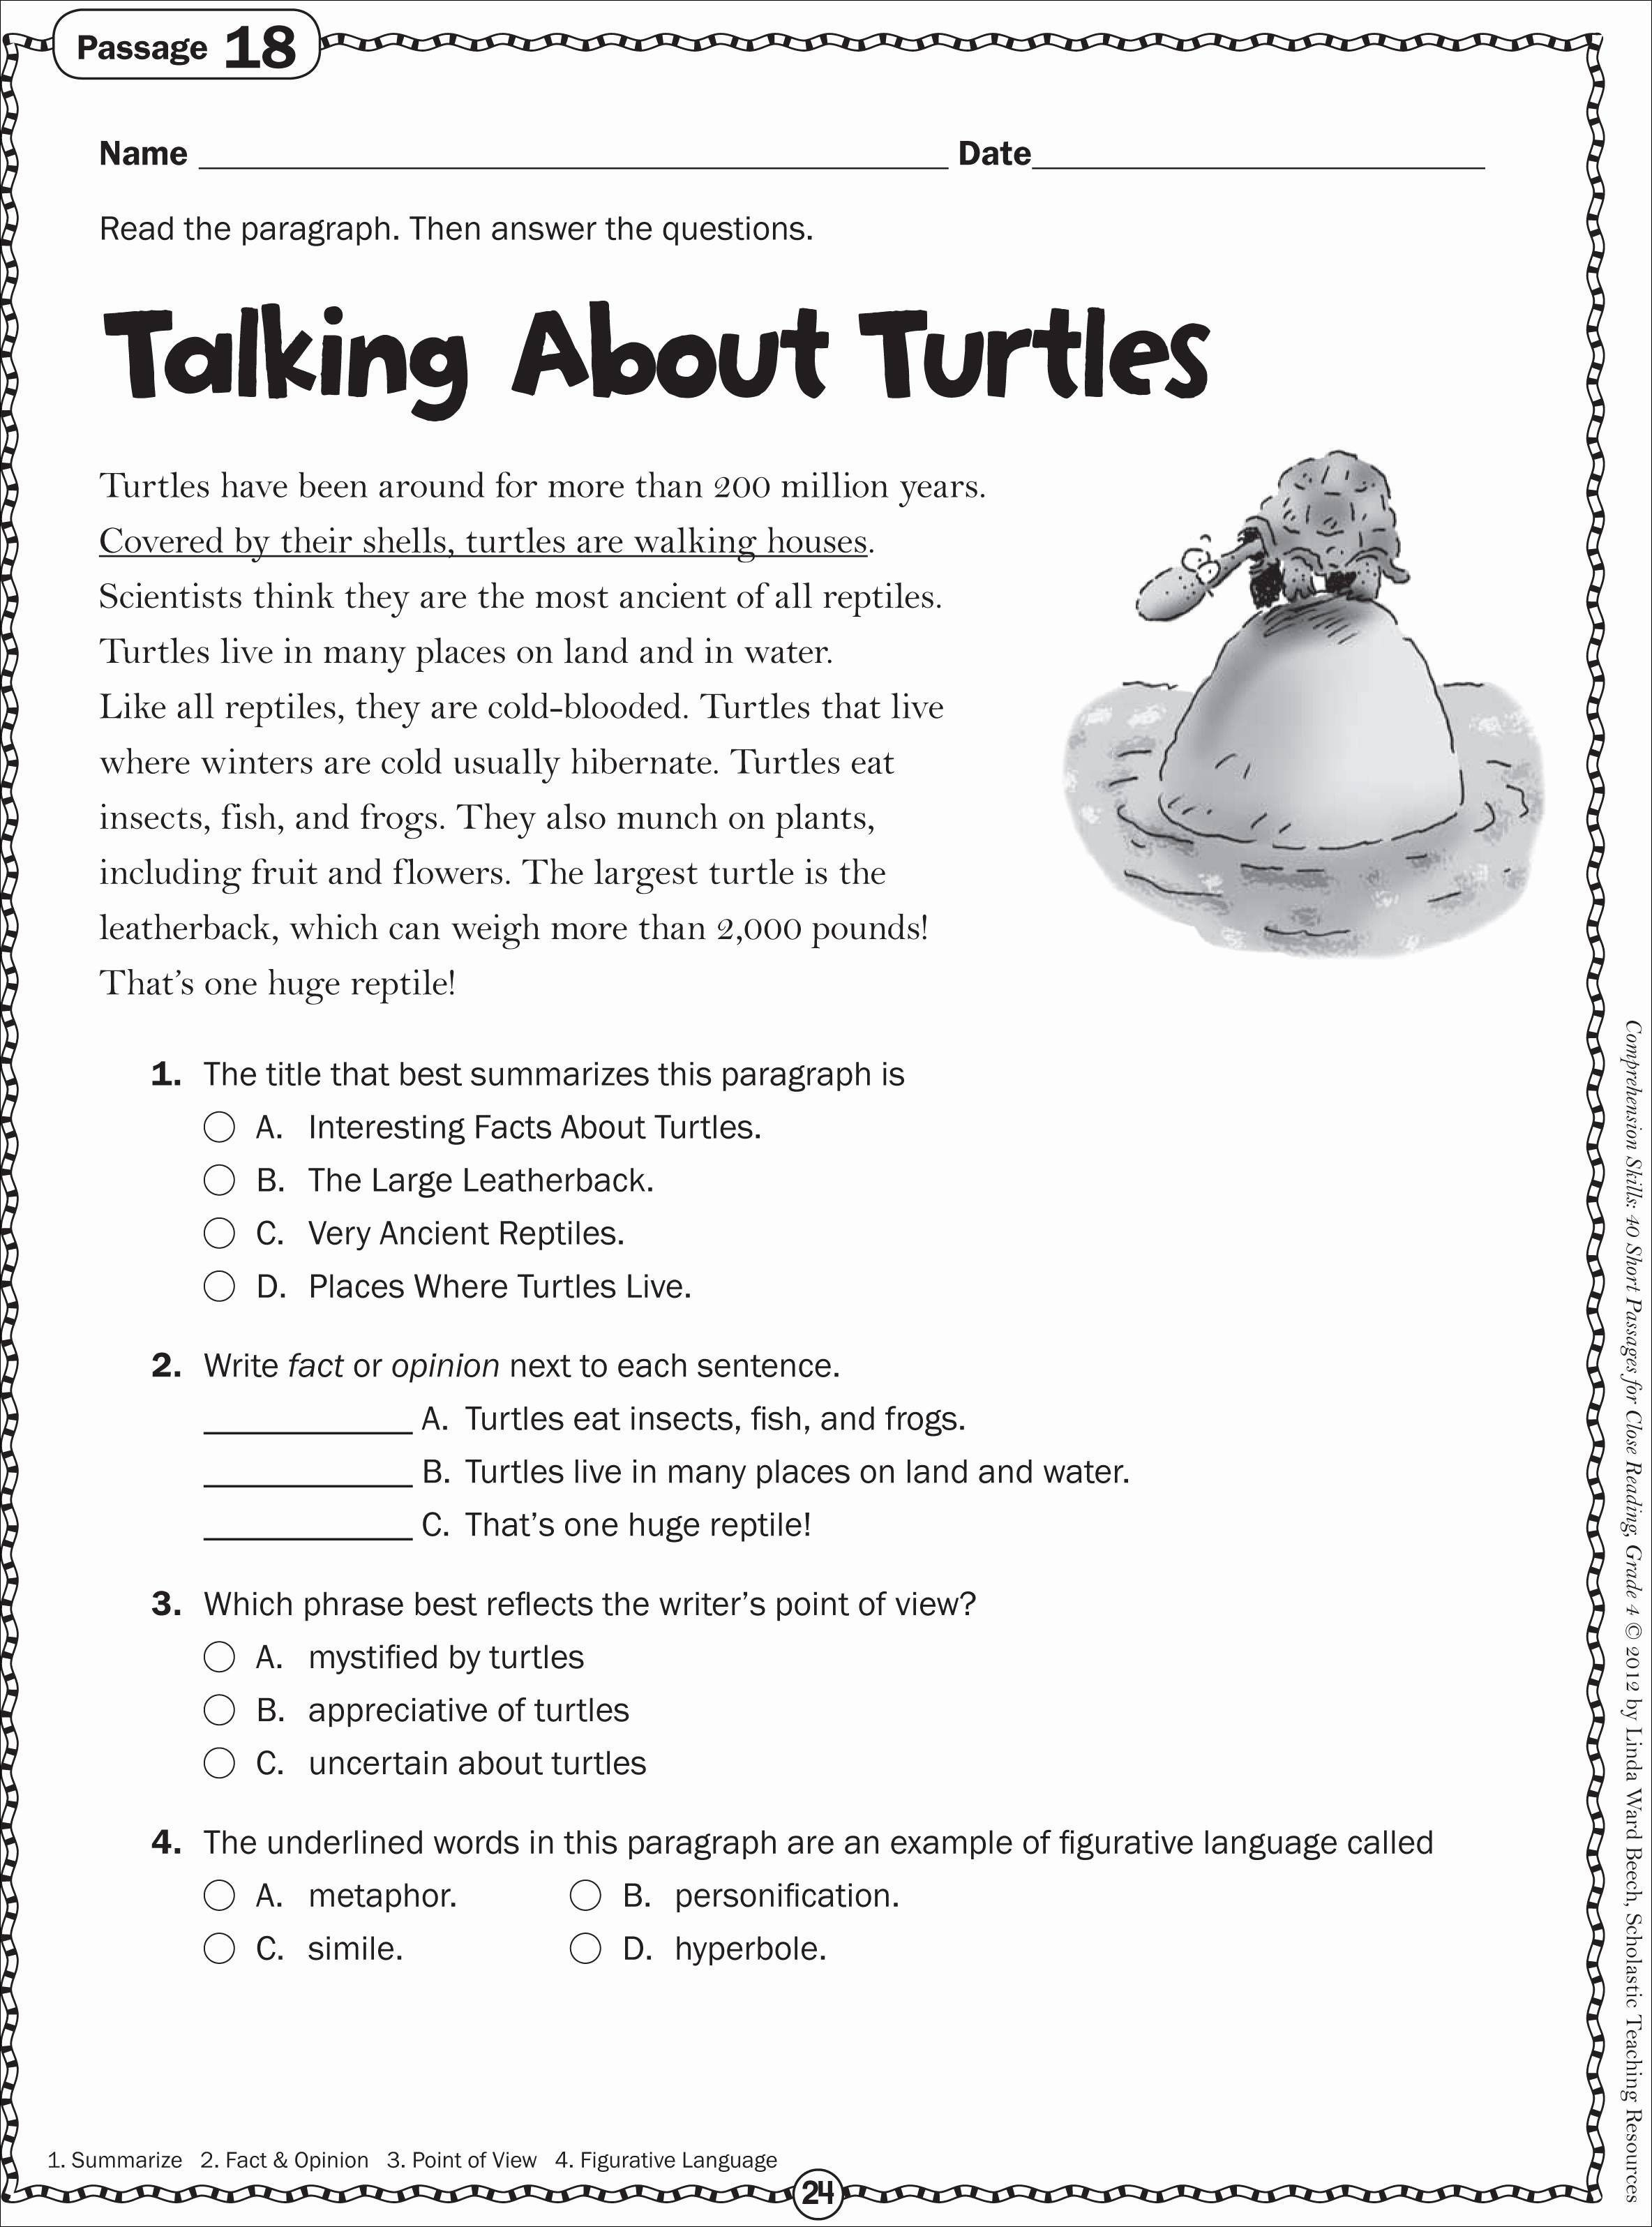 √ 2Nd Grade Reading Comprehension Worksheets Free Printable - Free Printable Reptile Worksheets